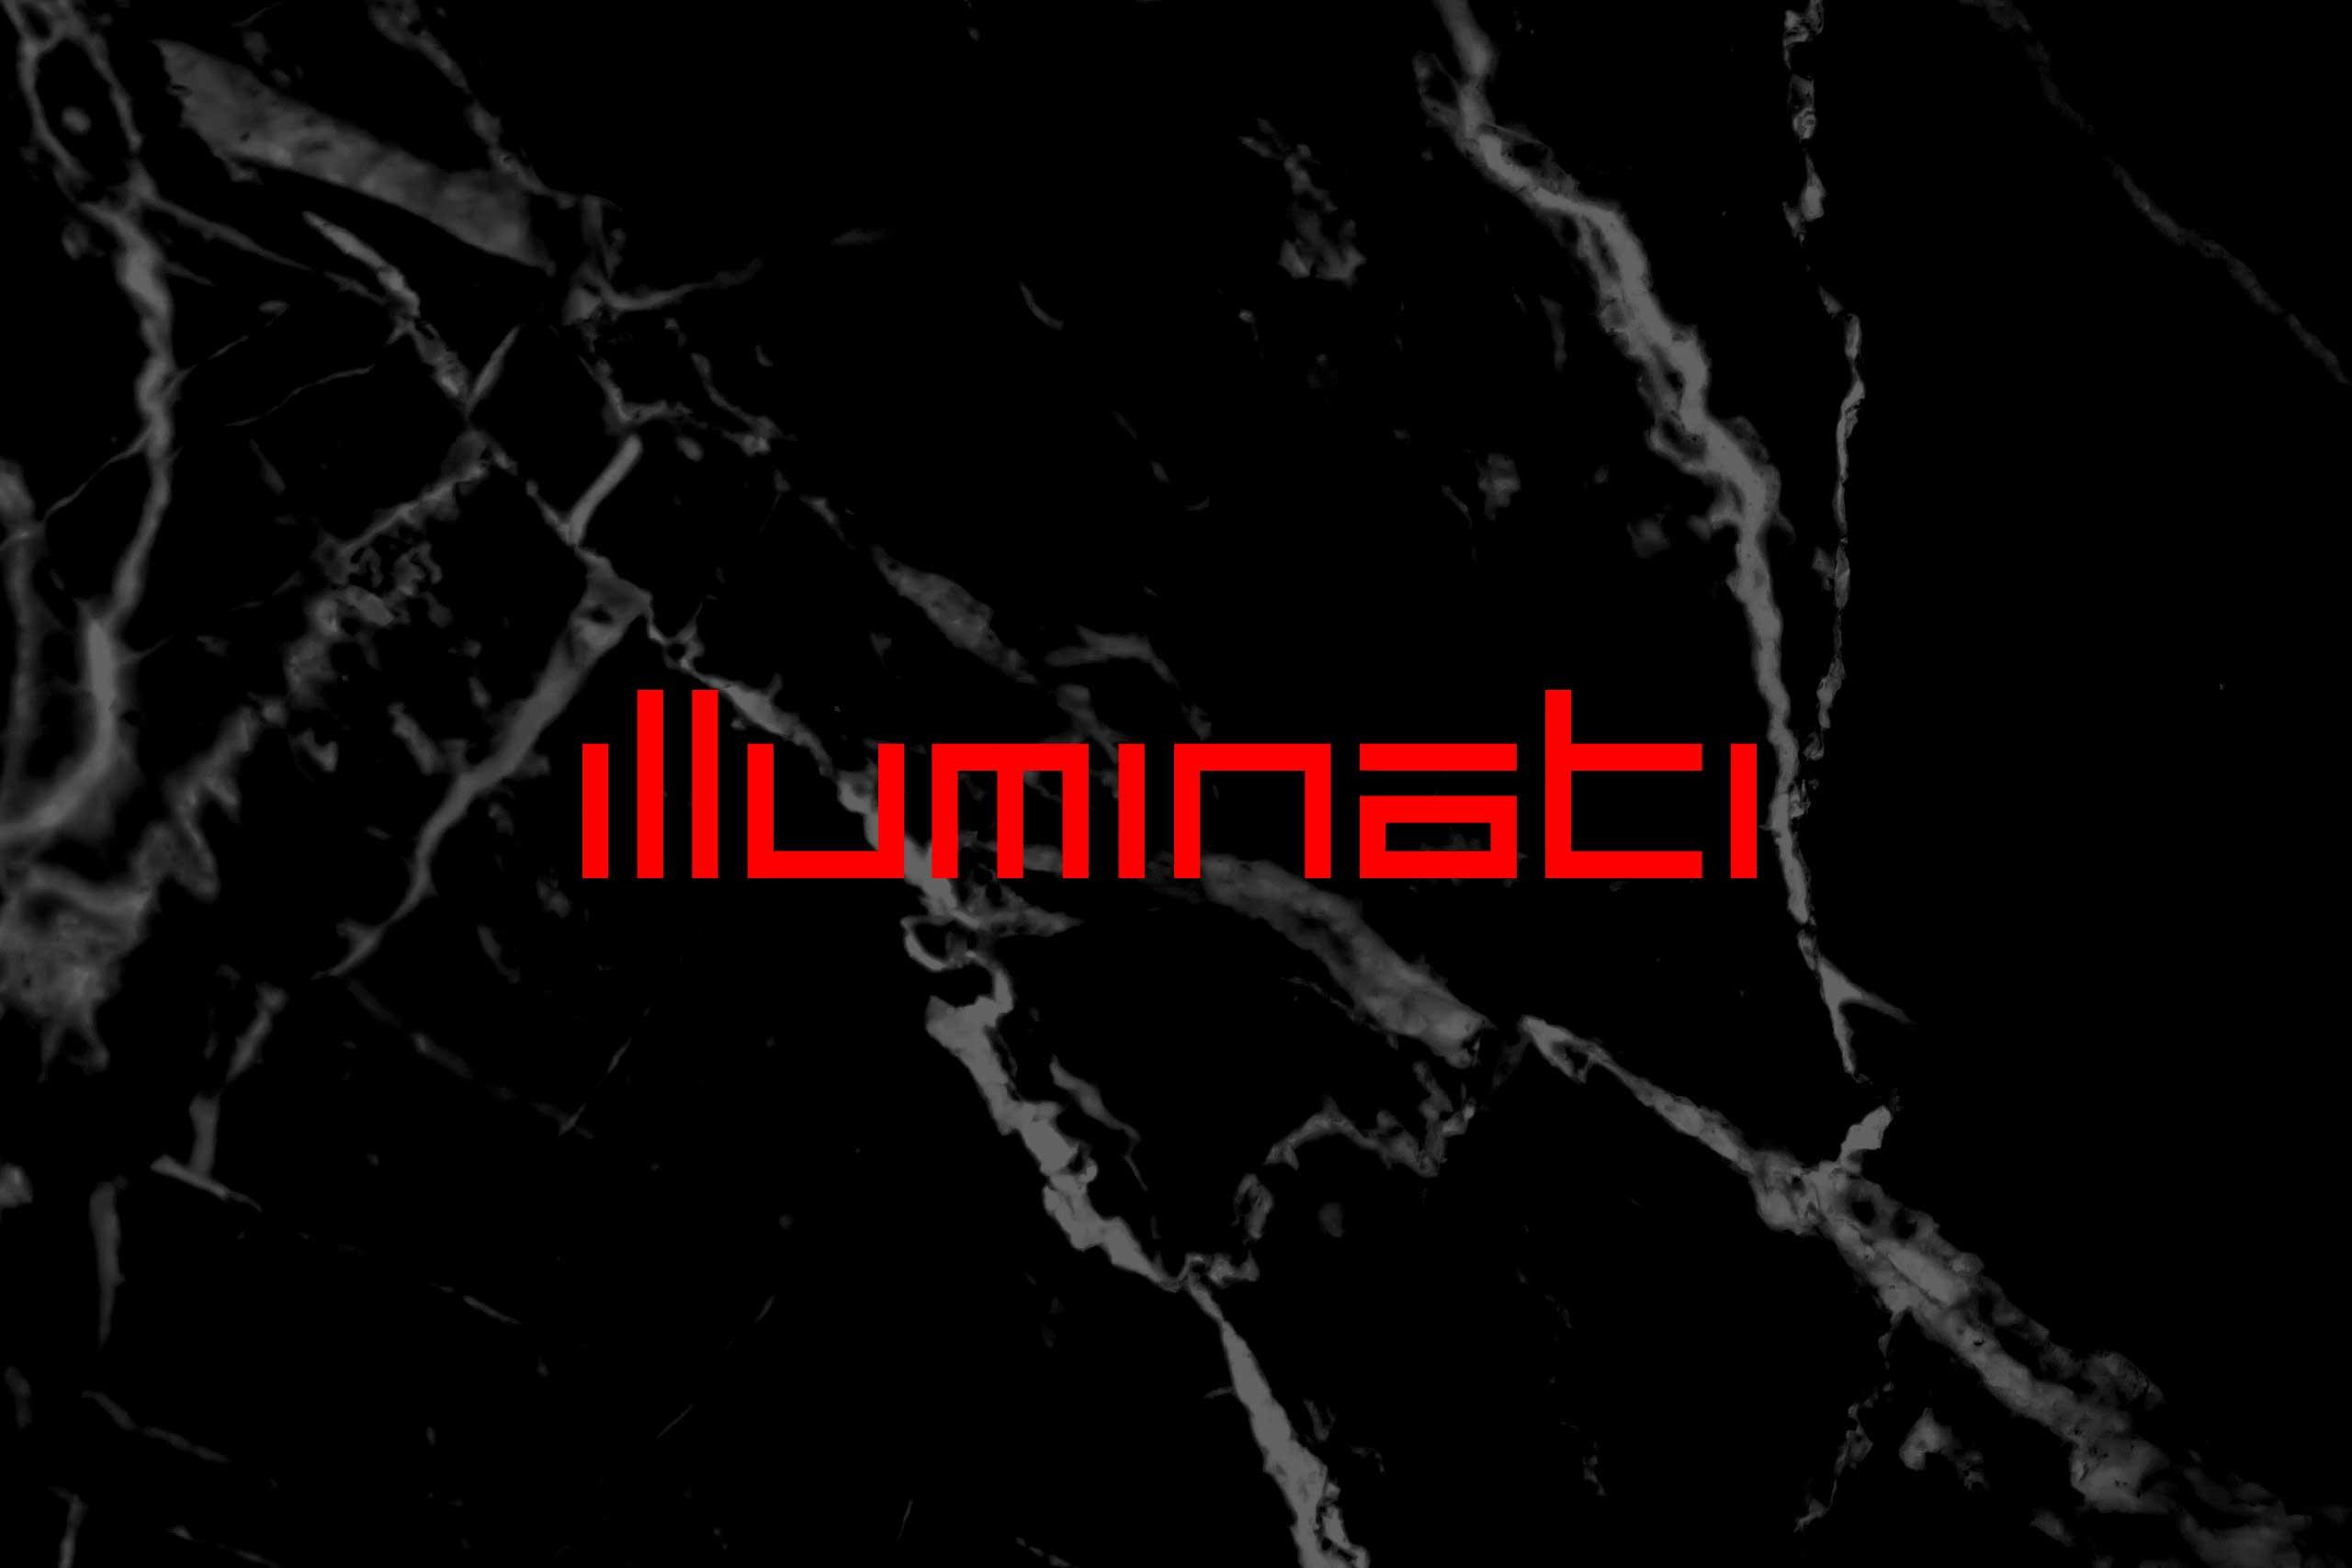 Illuminati Lighting brand identity after brand marketing expertise